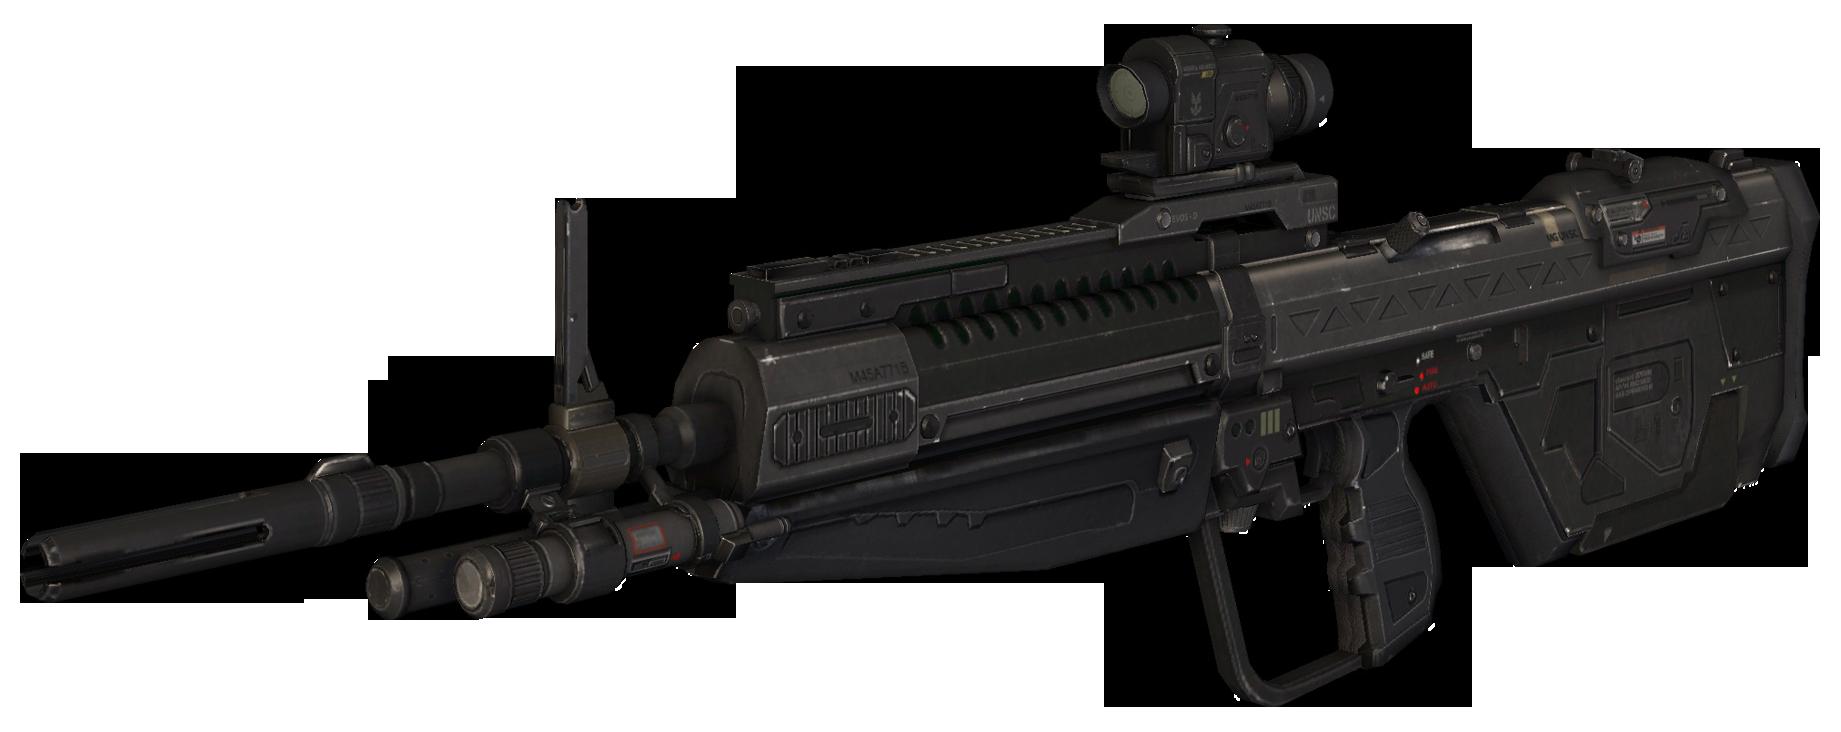 Machine Gun clipart modern By M392 Rifle Marksman FANDOM